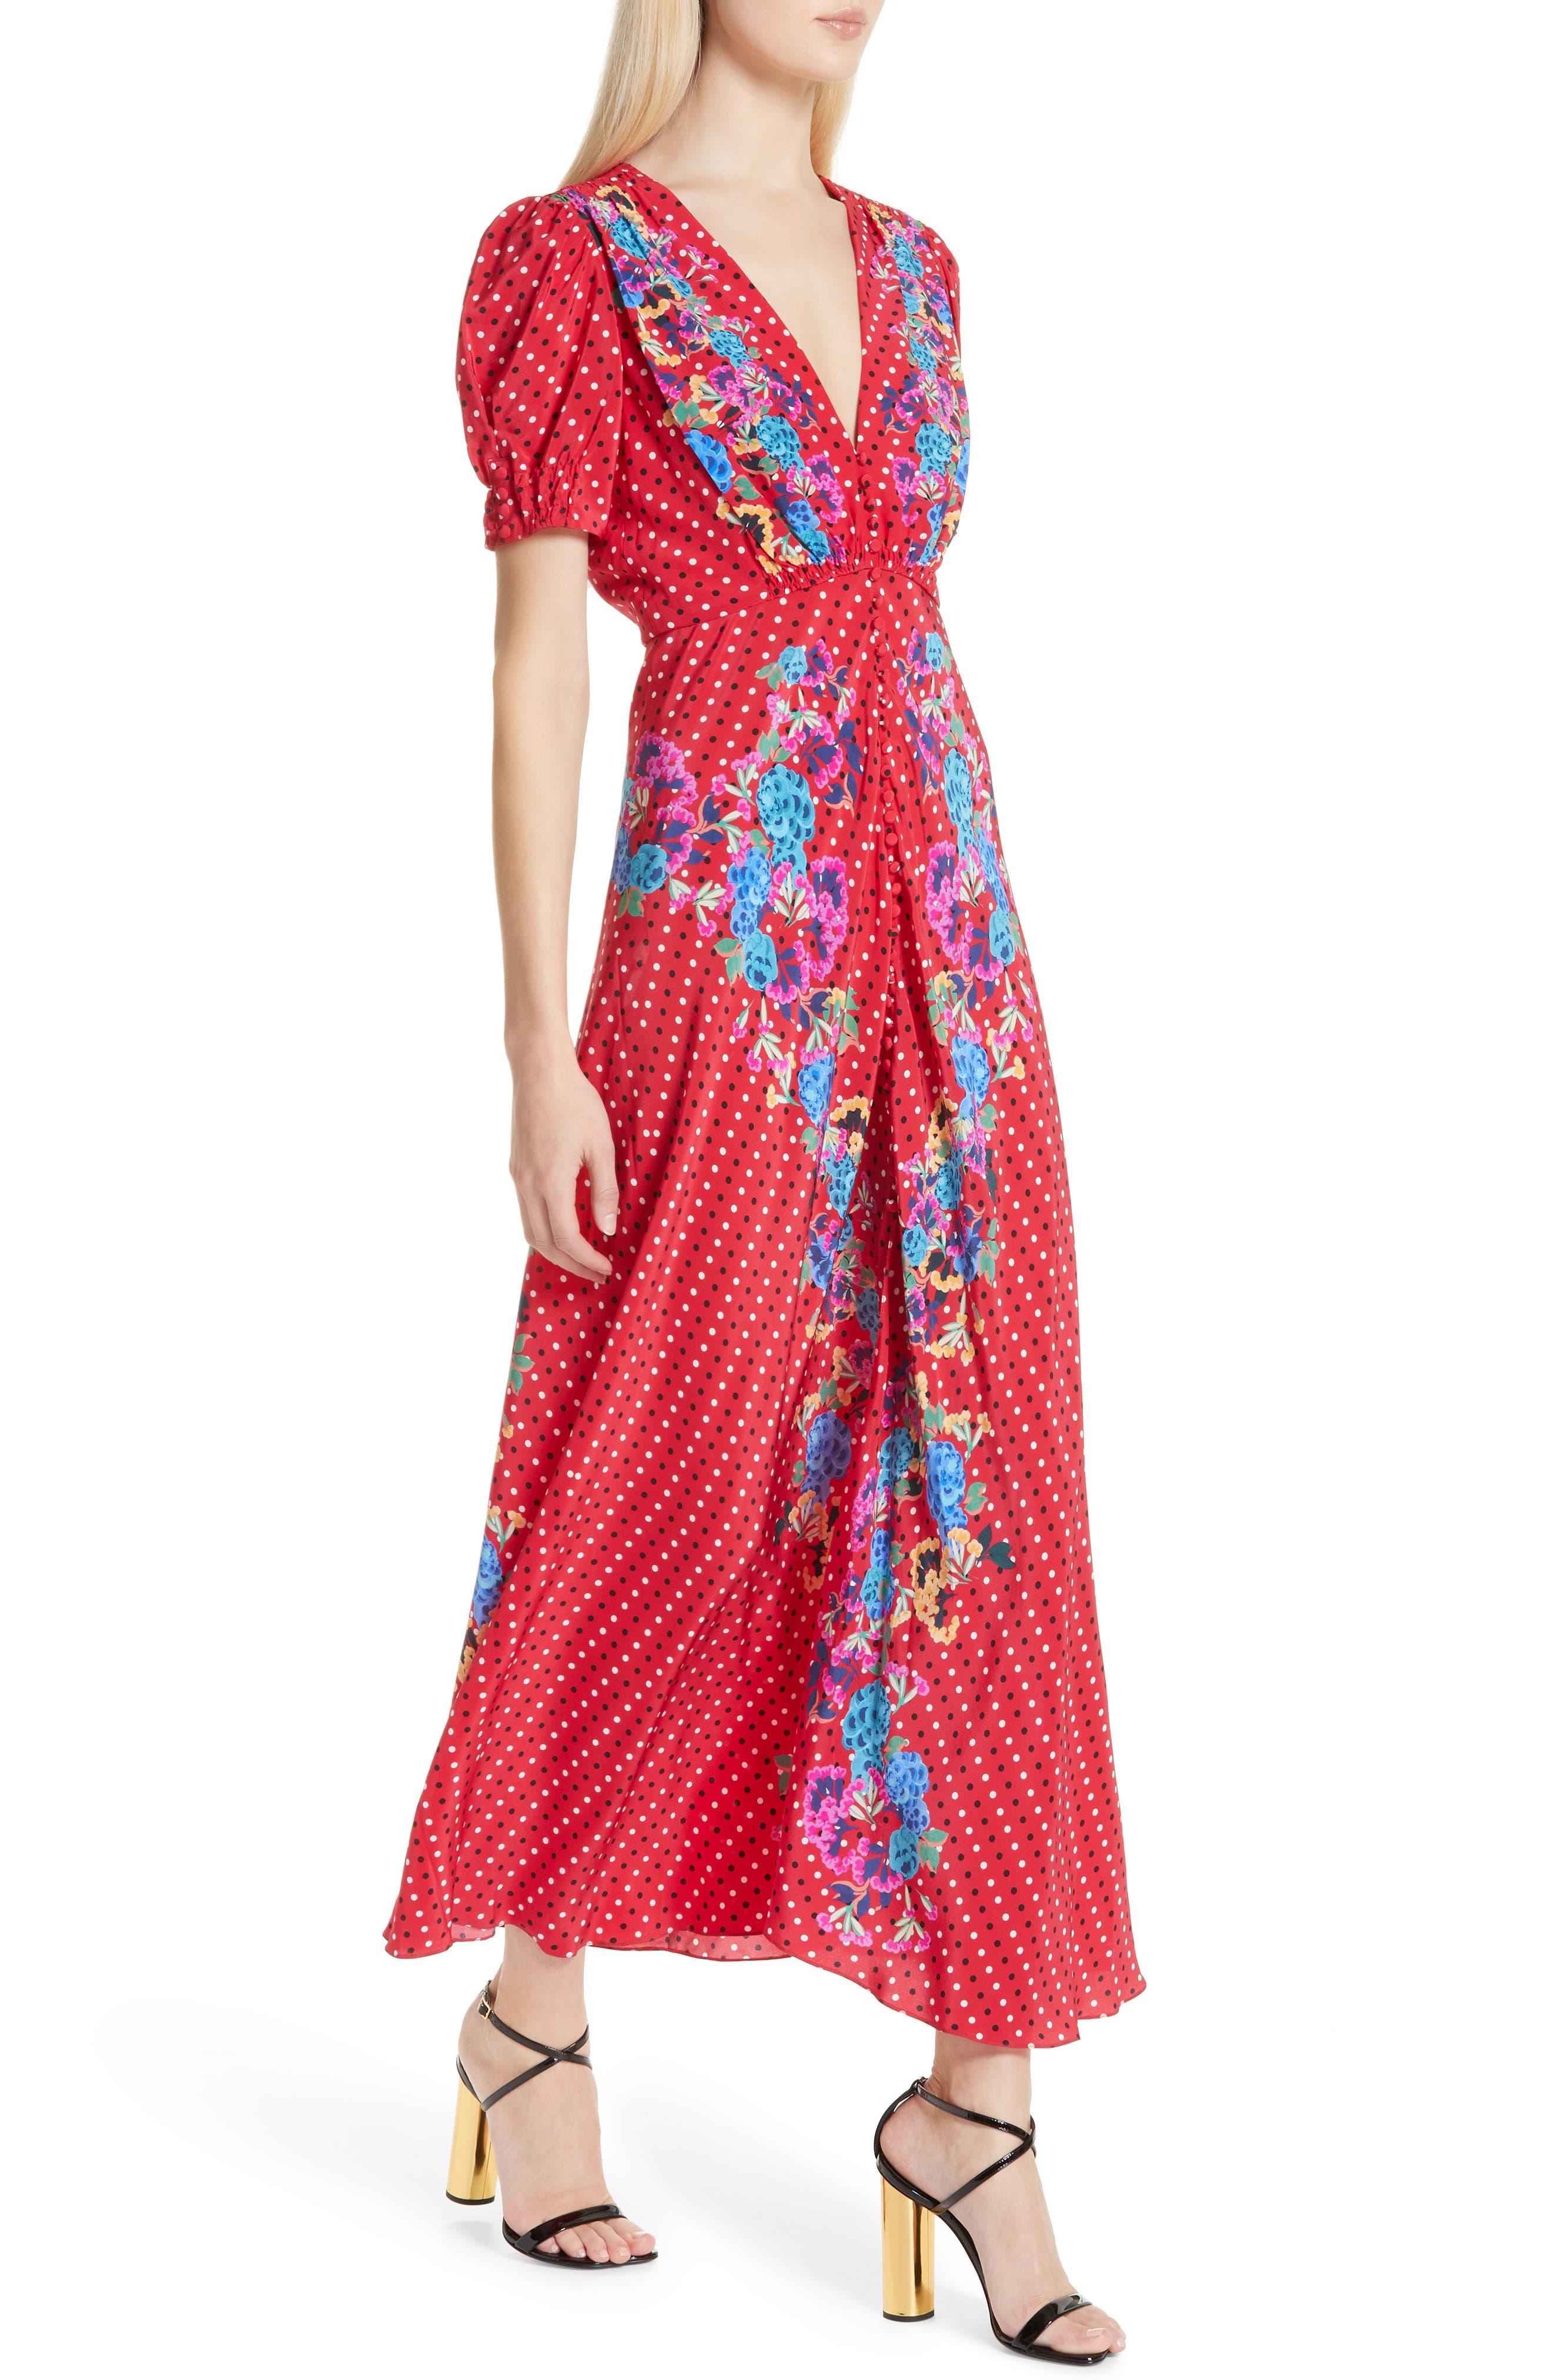 SALONI, Lea Print Silk Maxi Dress, Alternate thumbnail 4, color, SCARLET POLKA DOT